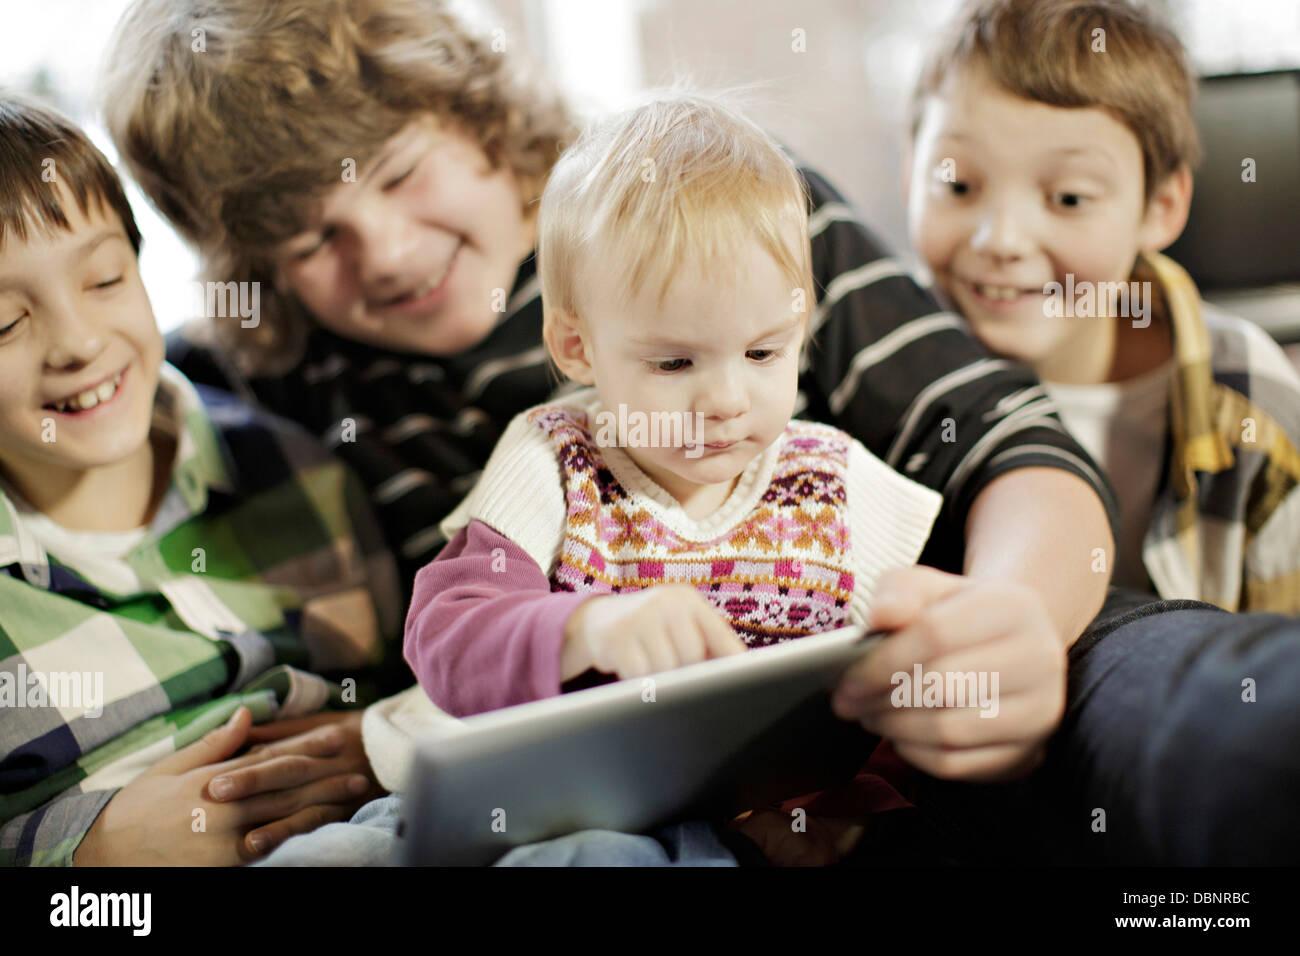 Children using digital tablet, Osijek, Croatia, Europe - Stock Image